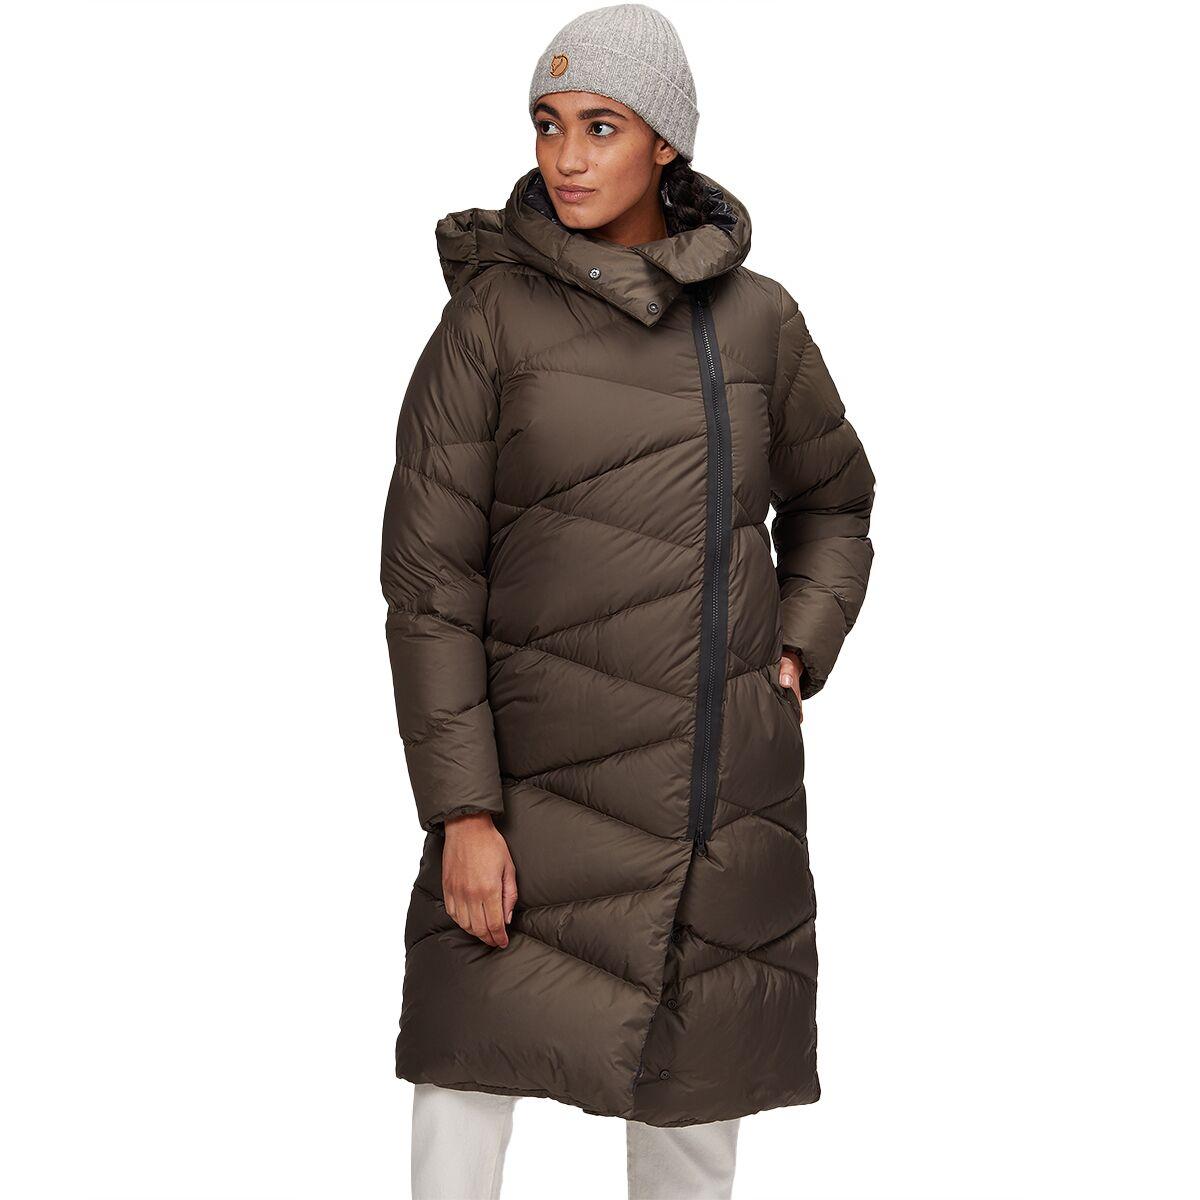 Tundra Down Coat - Women